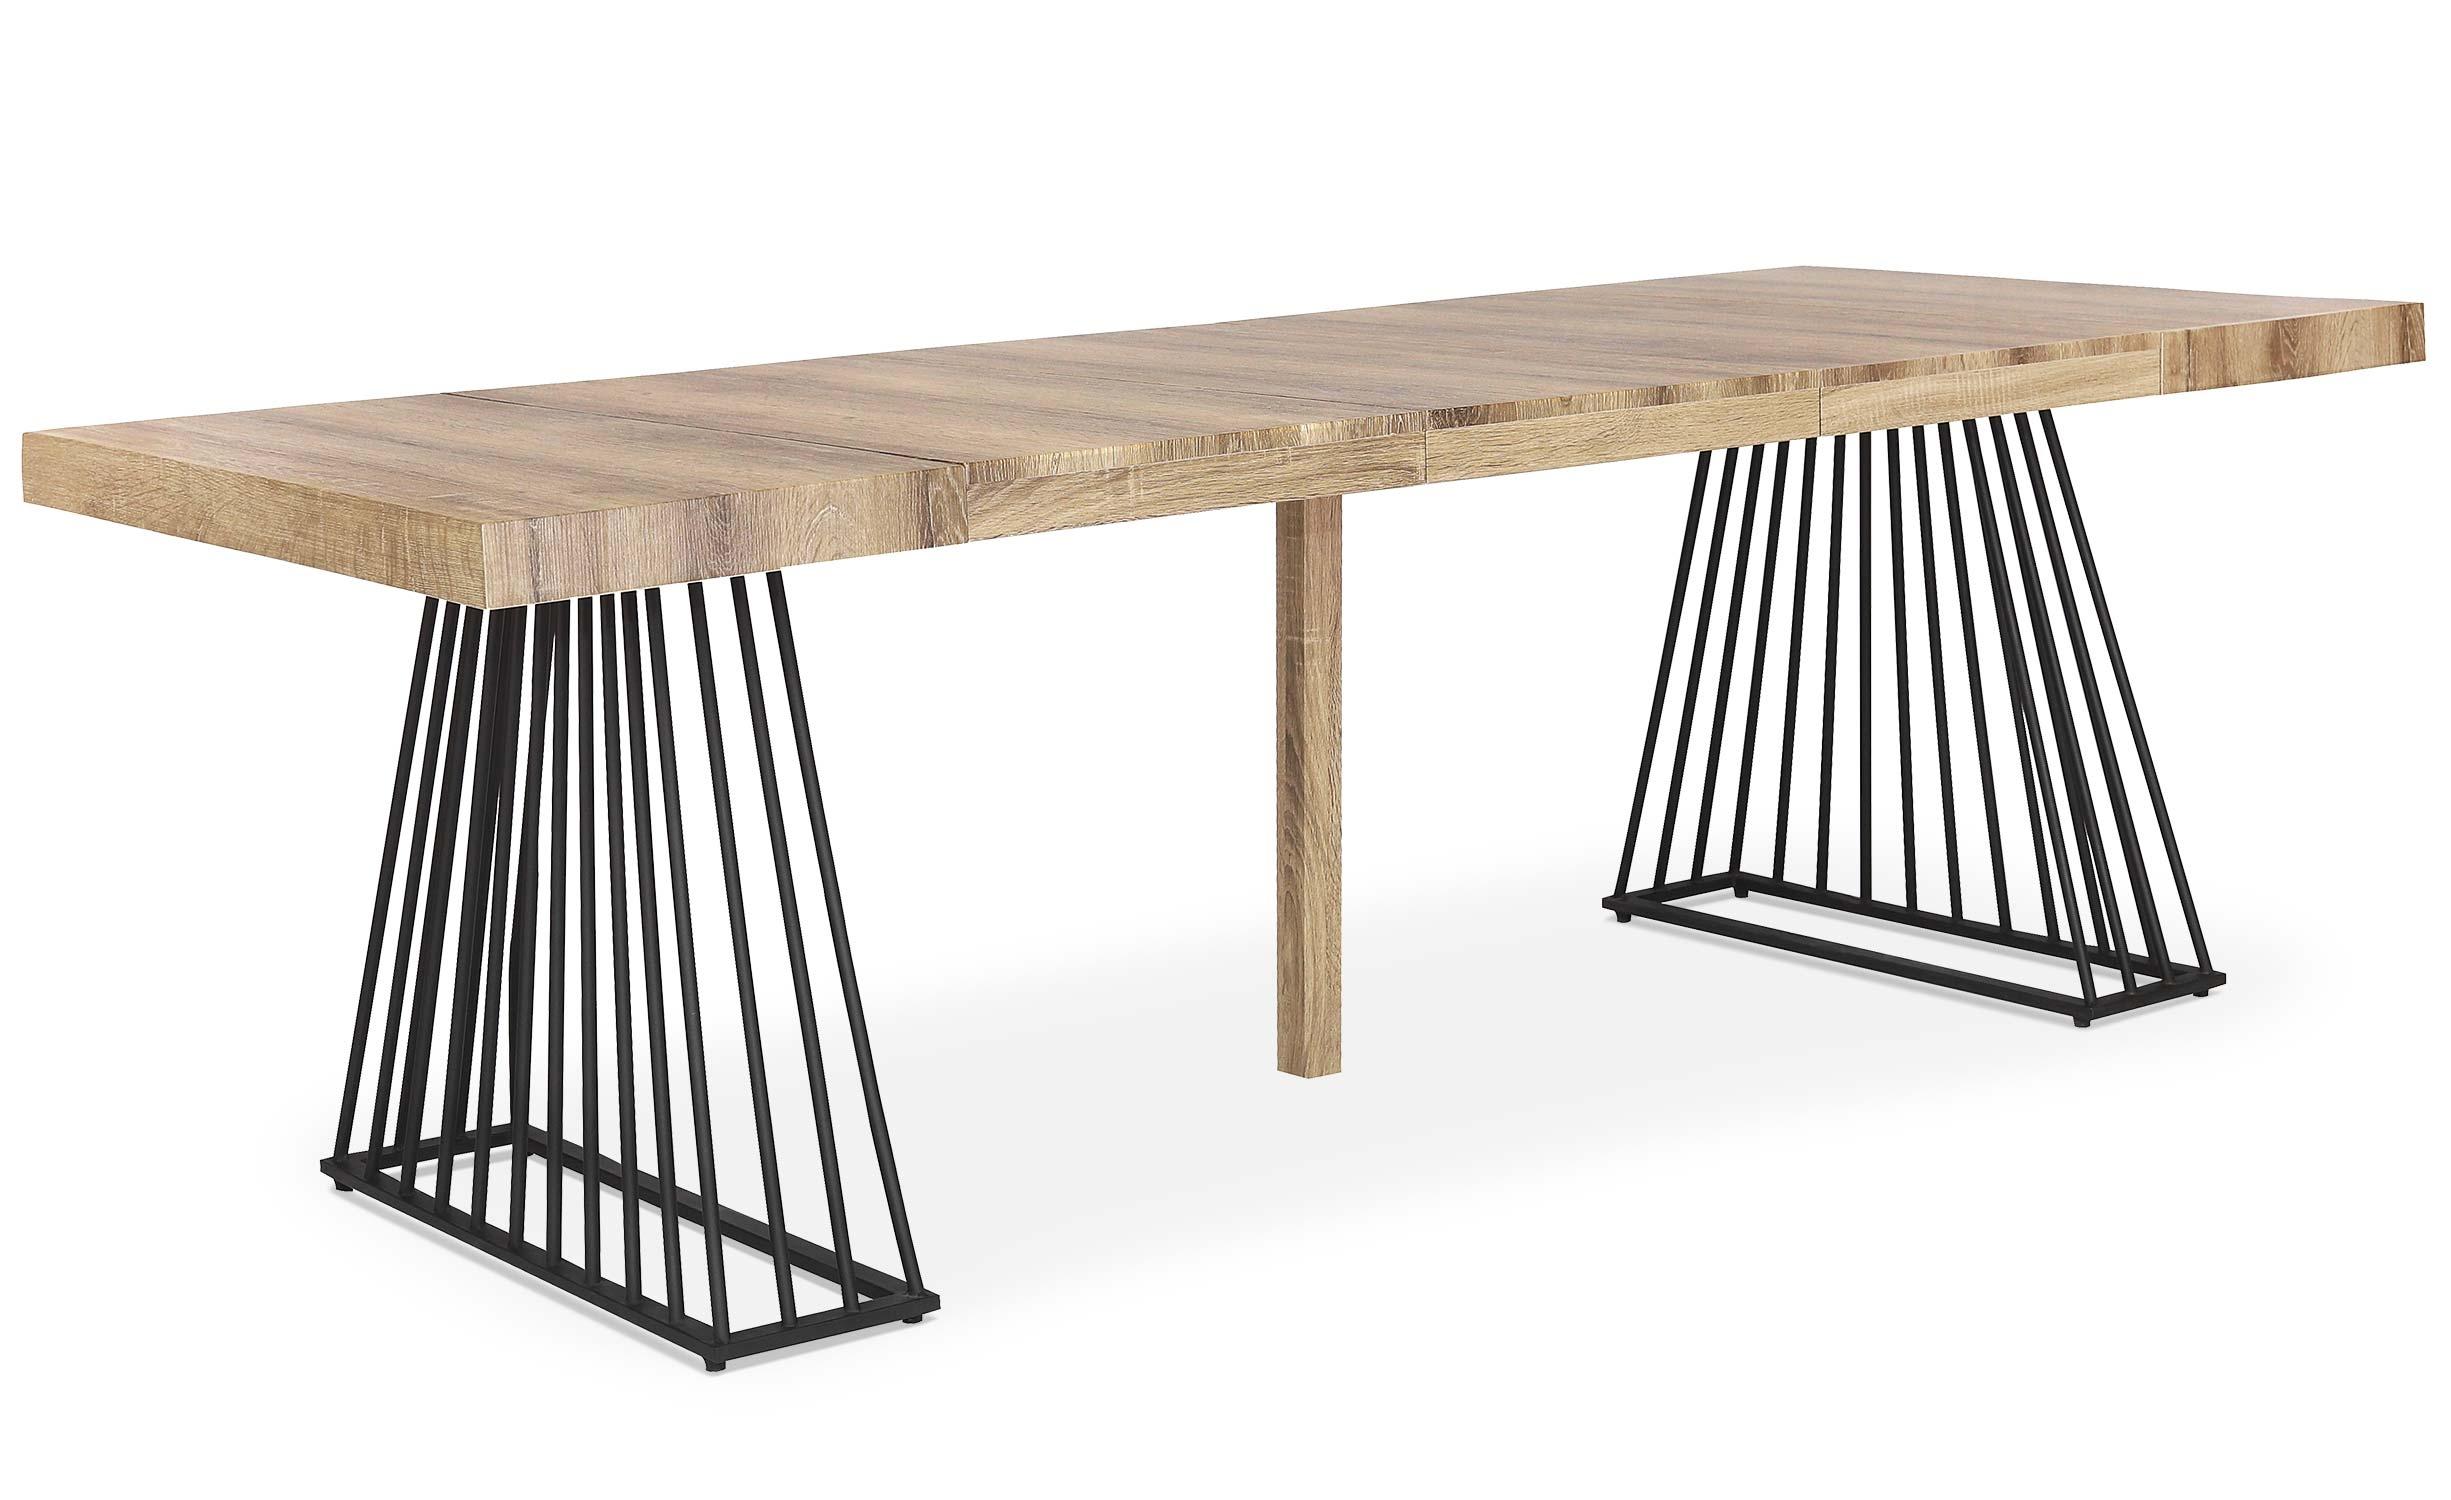 Fabriek uitschuifbare tafel Sonoma hout